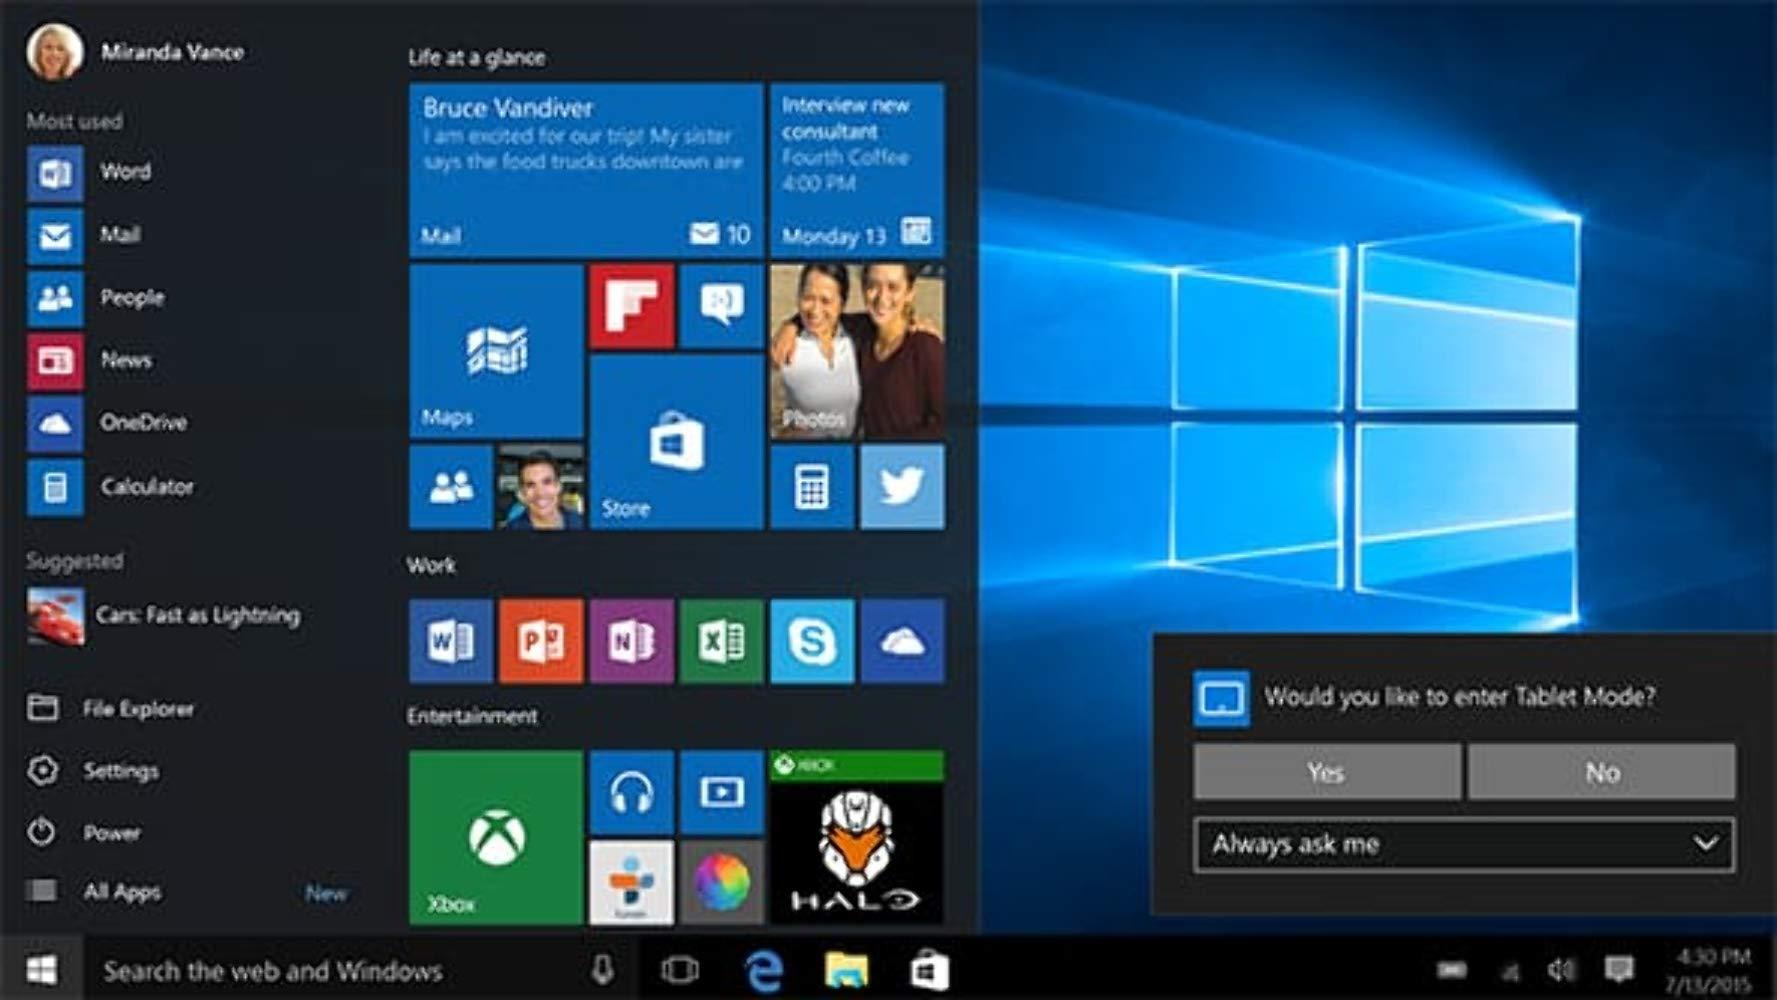 Microsoft Windows 10 Pro 32/64 Bits Clave Licencia 100% Genuina WIN 10, Multilenguaje: Amazon.es: Electrónica